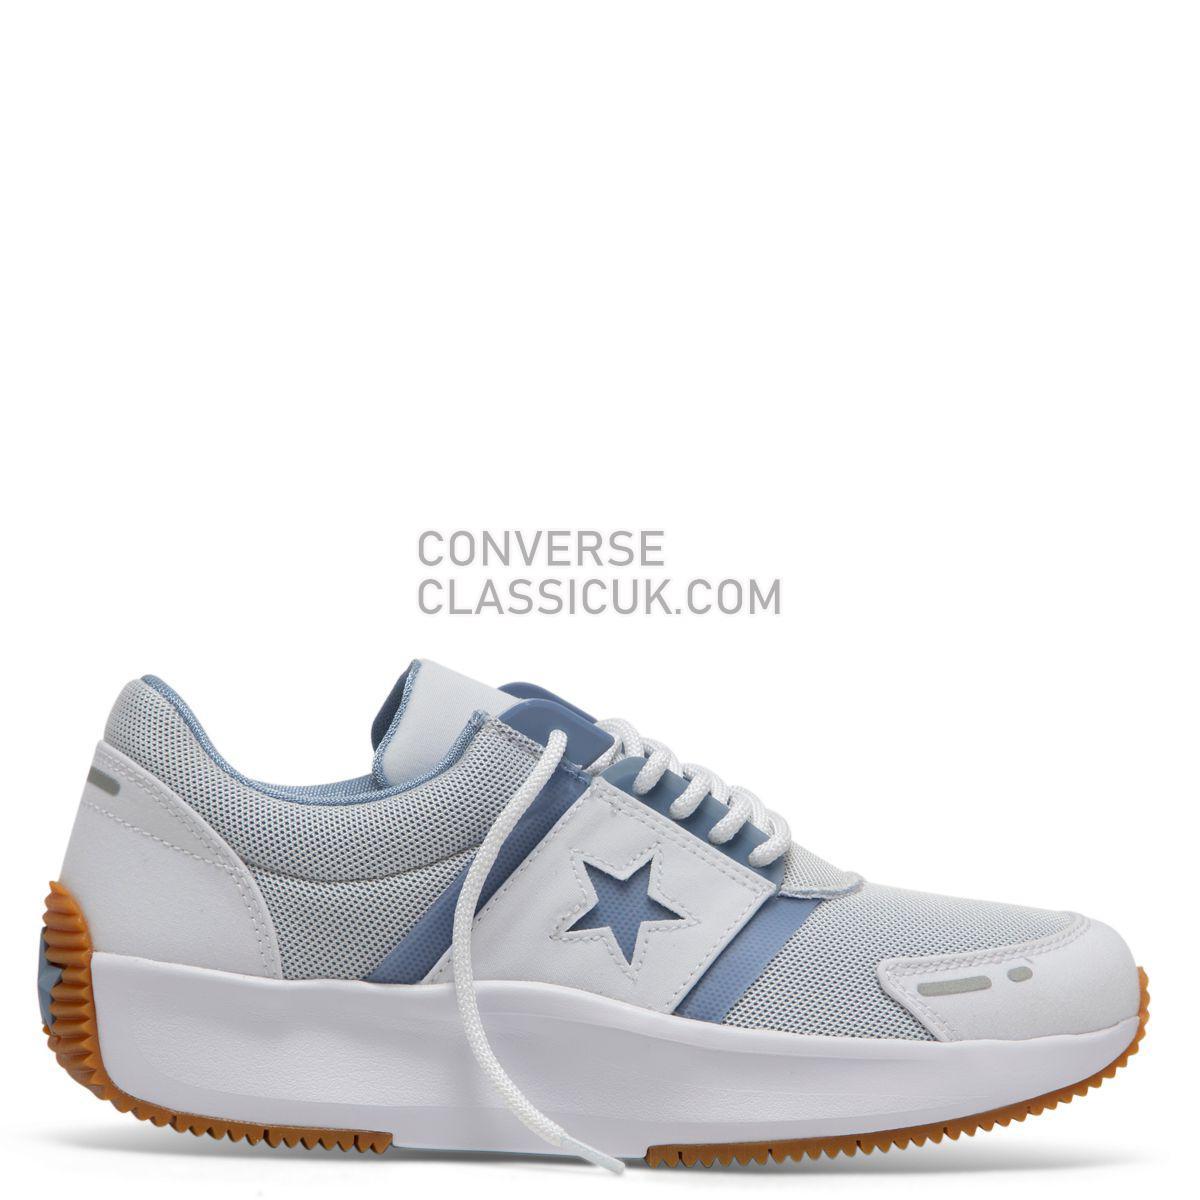 Converse Run Star Retro Glow Low Top Wild White/Indigo Fog Mens 164292 White/Indigo Fog/White Shoes